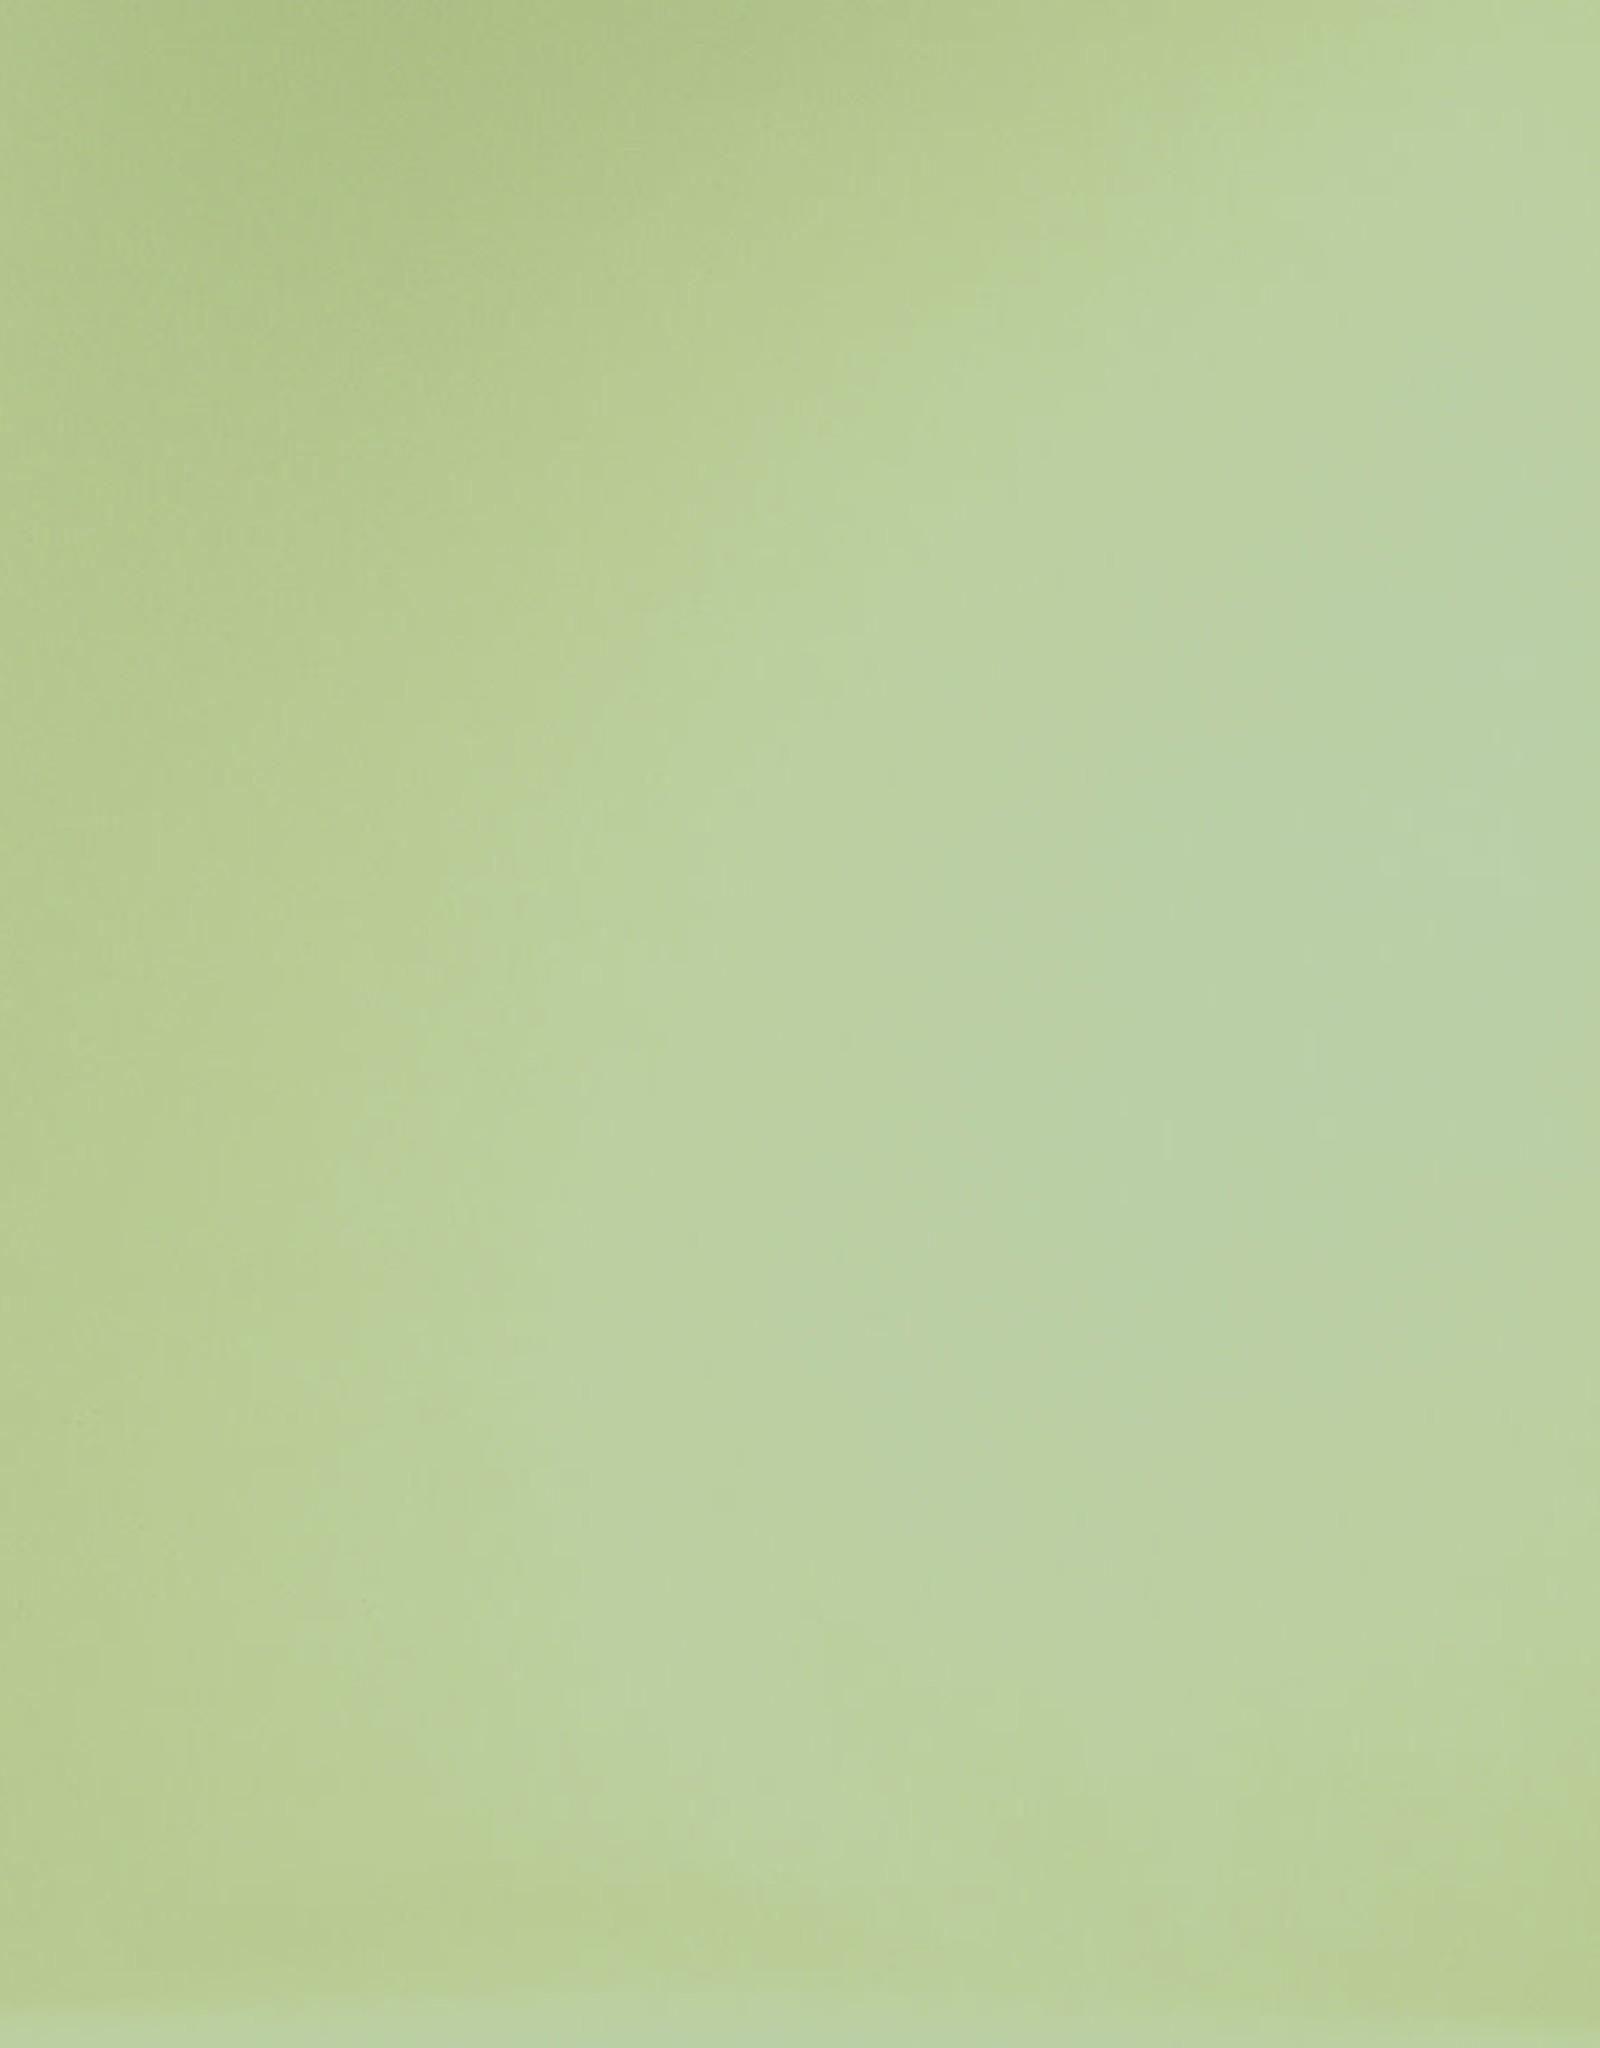 Superior Seamless Superior Seamless 9' Tropical Green #13